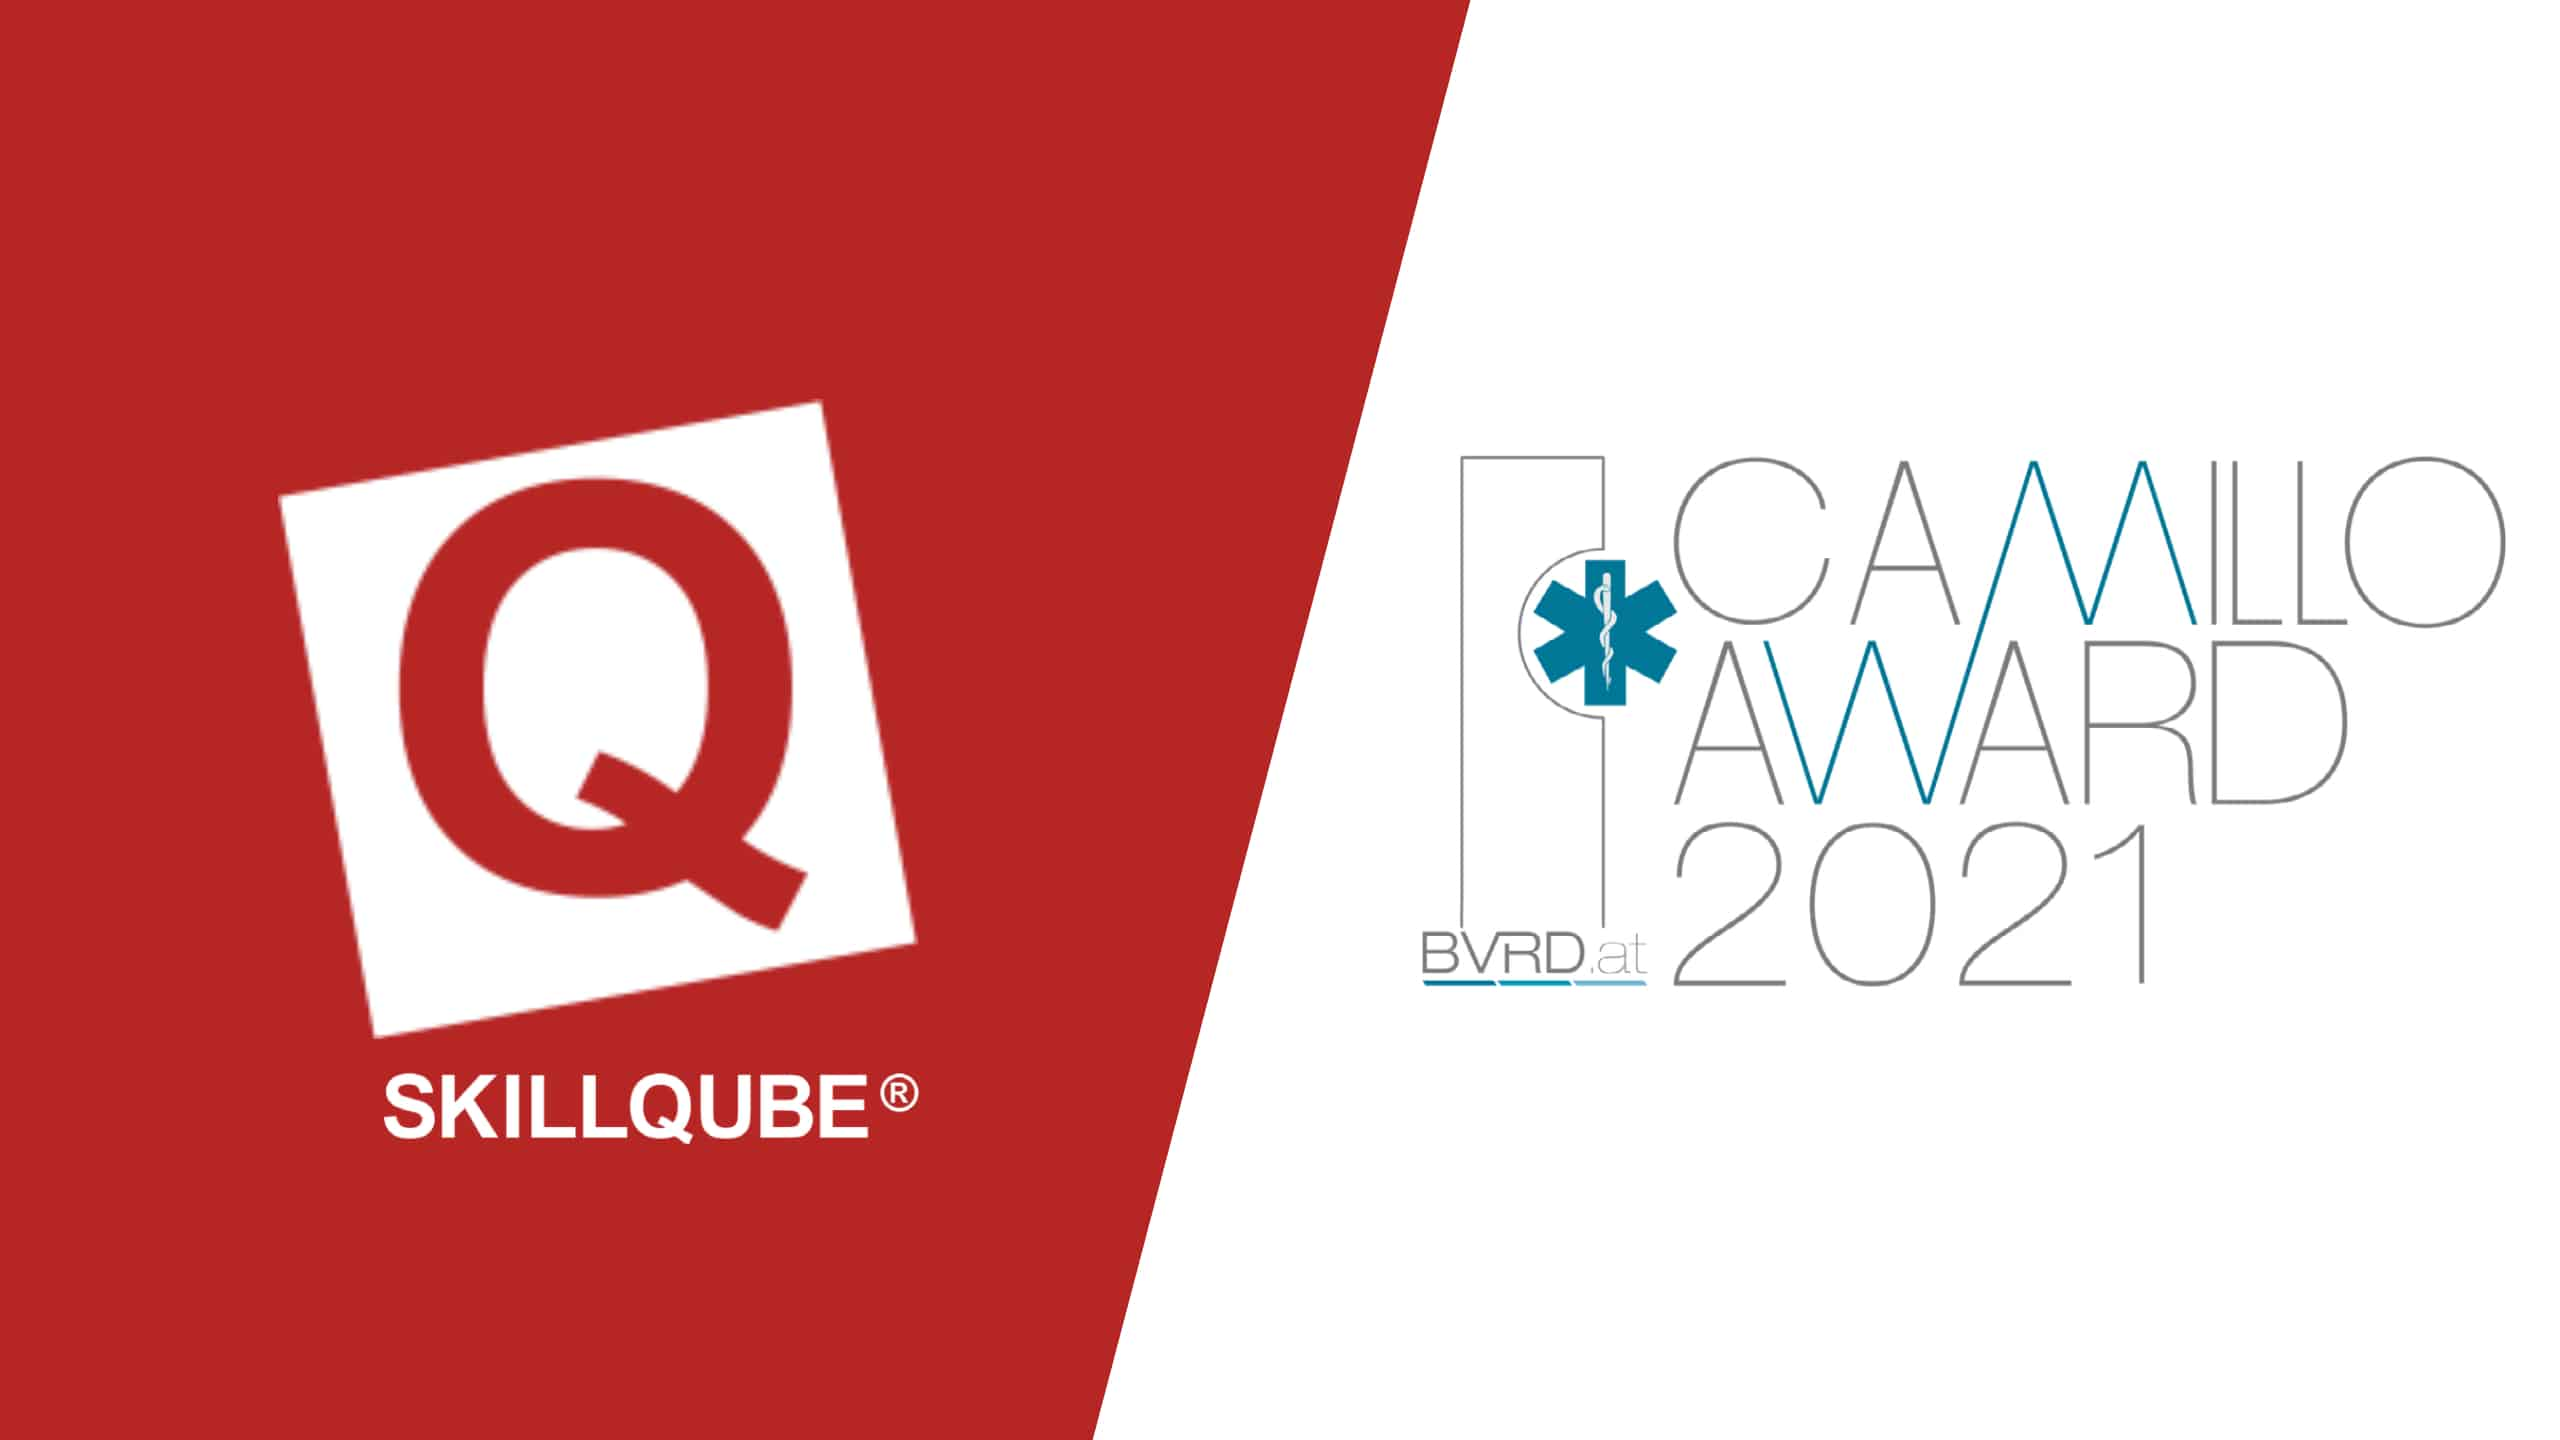 SKILLQUBE unterstützt den Camillo Award